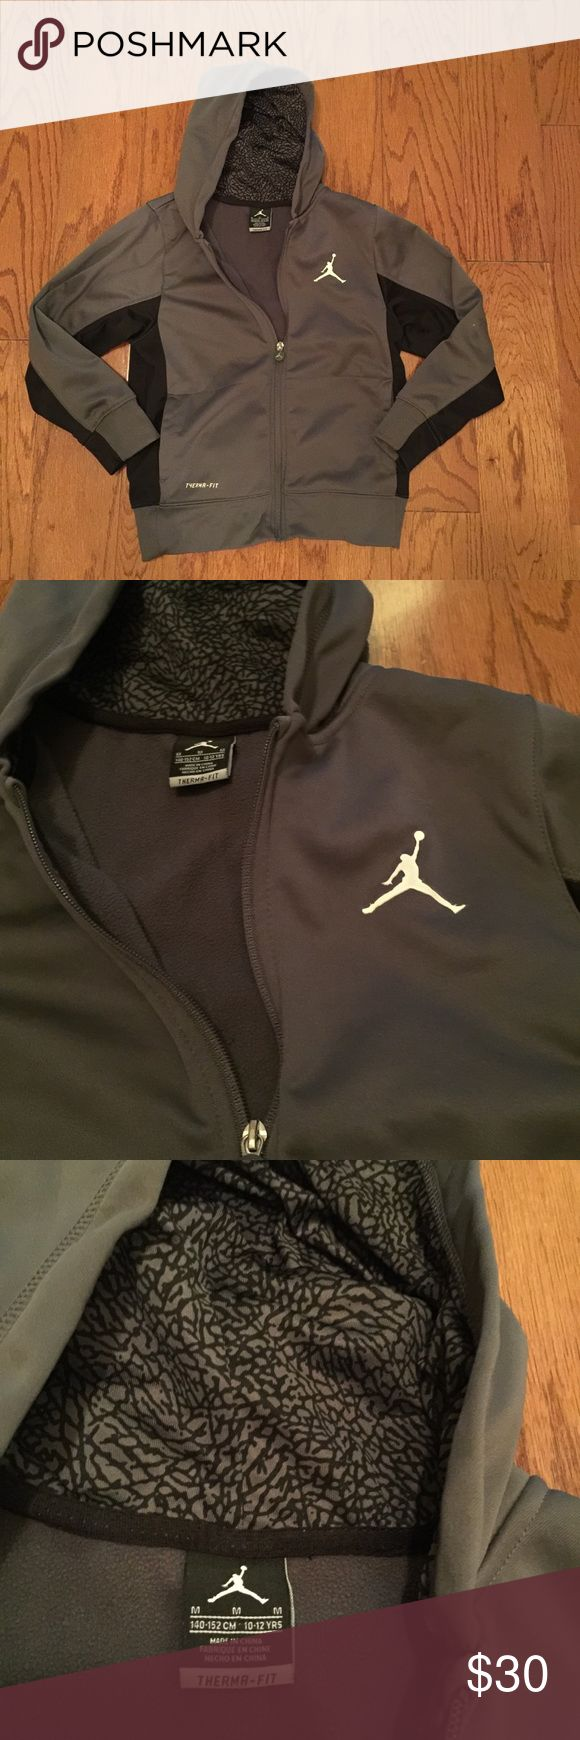 Boys/youth Air Jordan jacket Good condition, minor spot on sleeve. Size on tag is a 10-12. Air Jordan Jackets & Coats